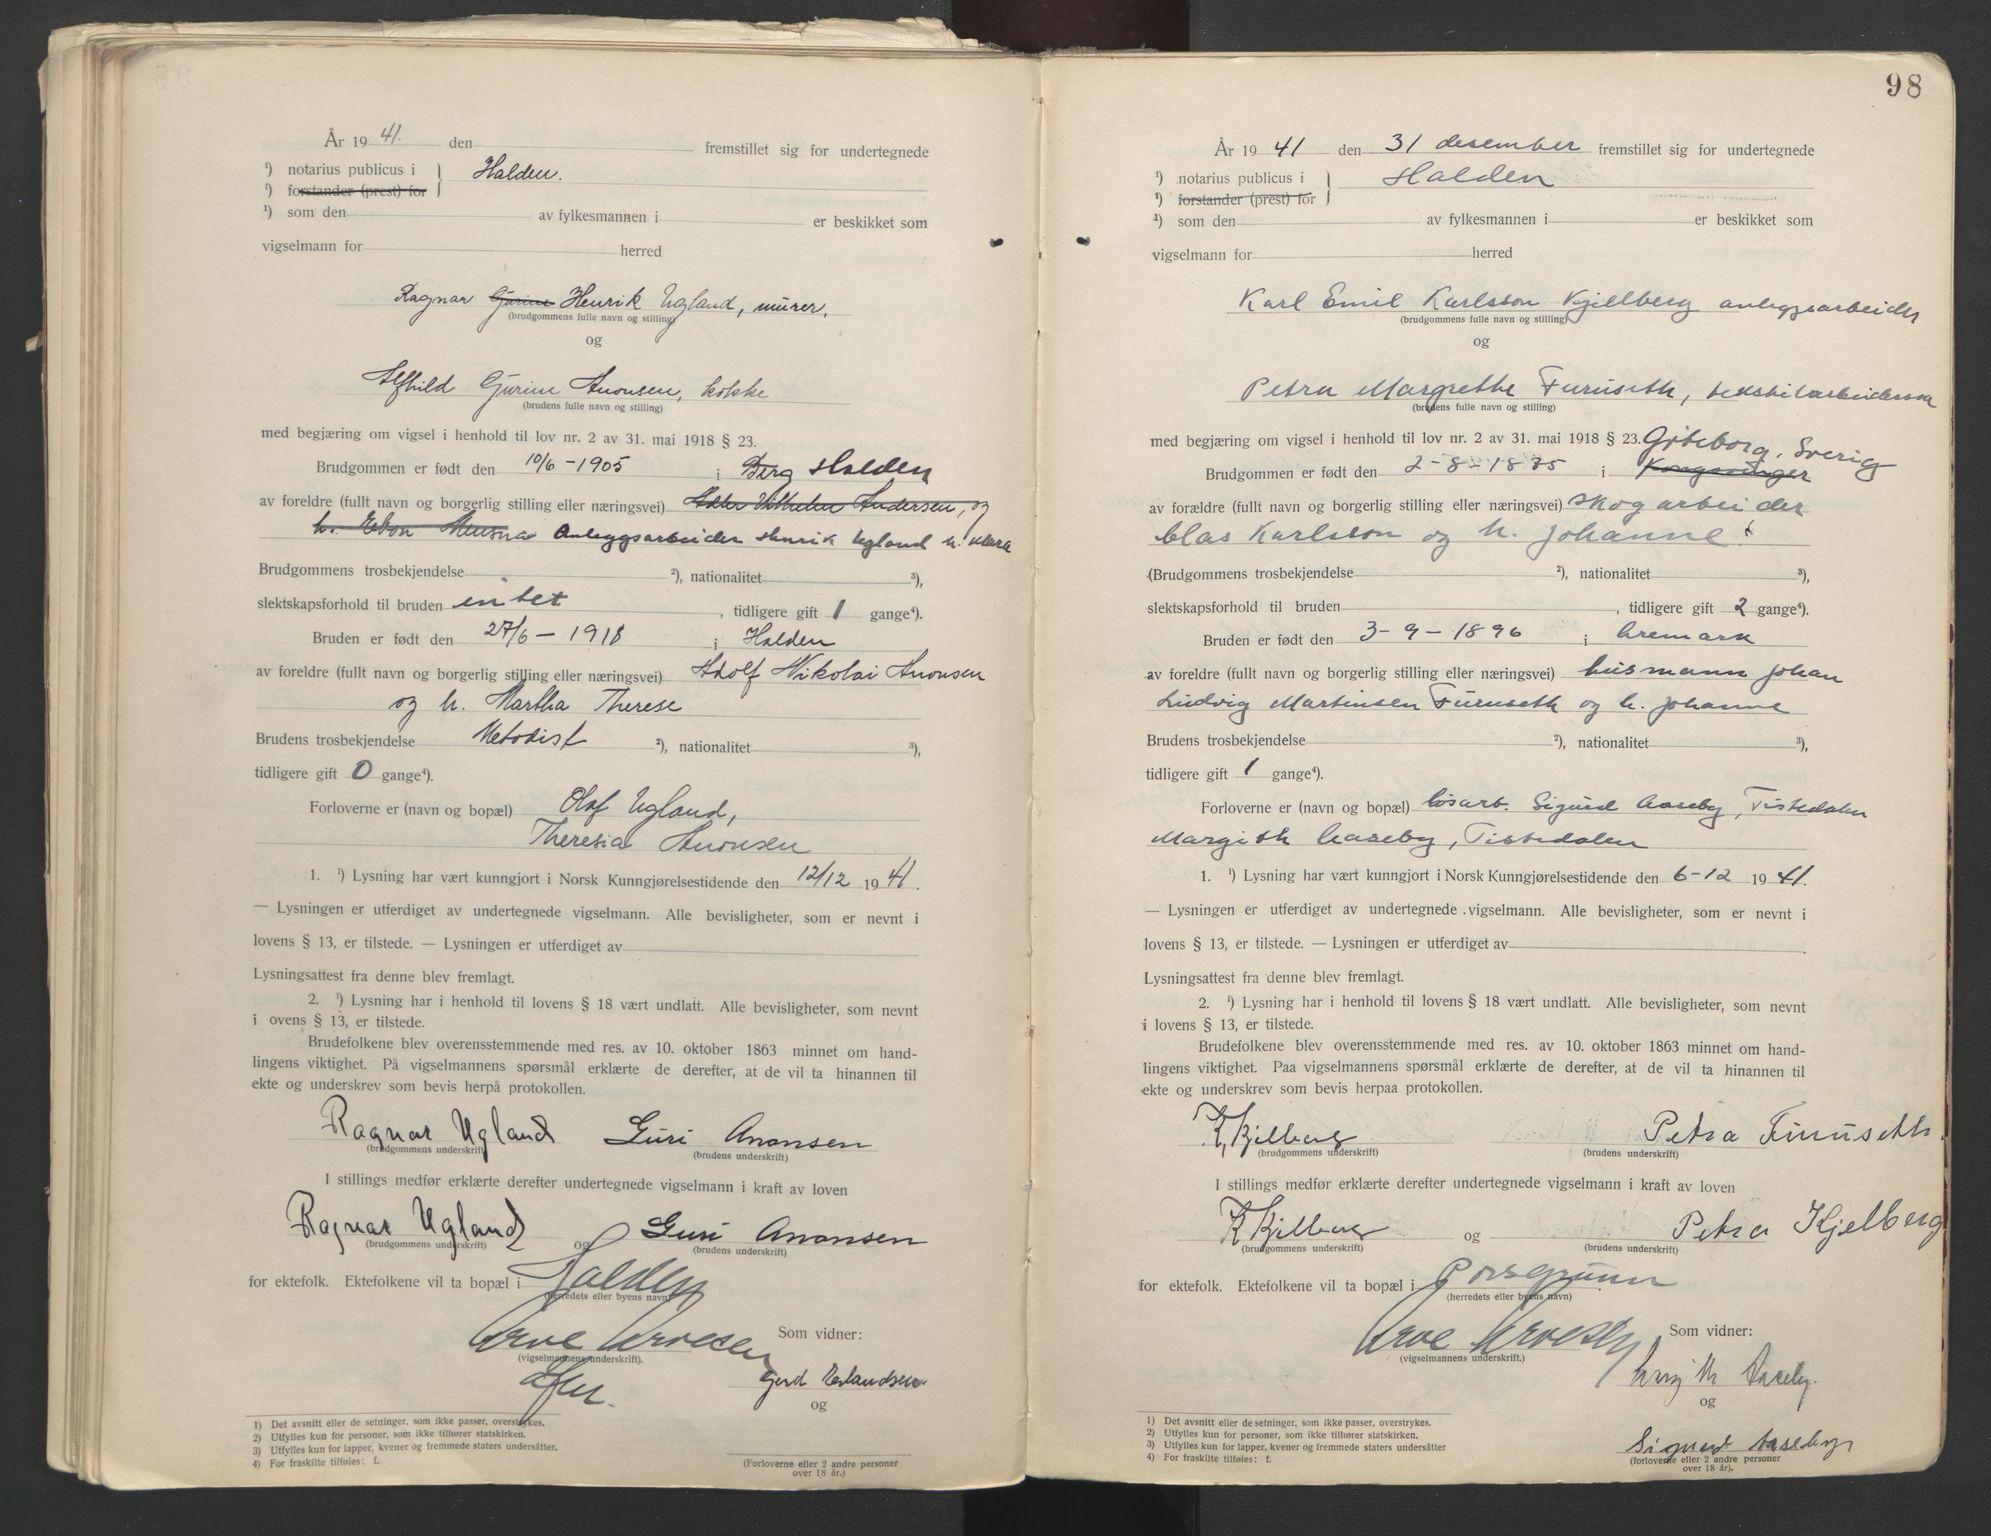 SAO, Idd og Marker sorenskriveri, L/Lc/L0001: Vigselsbøker, 1920-1942, s. 98